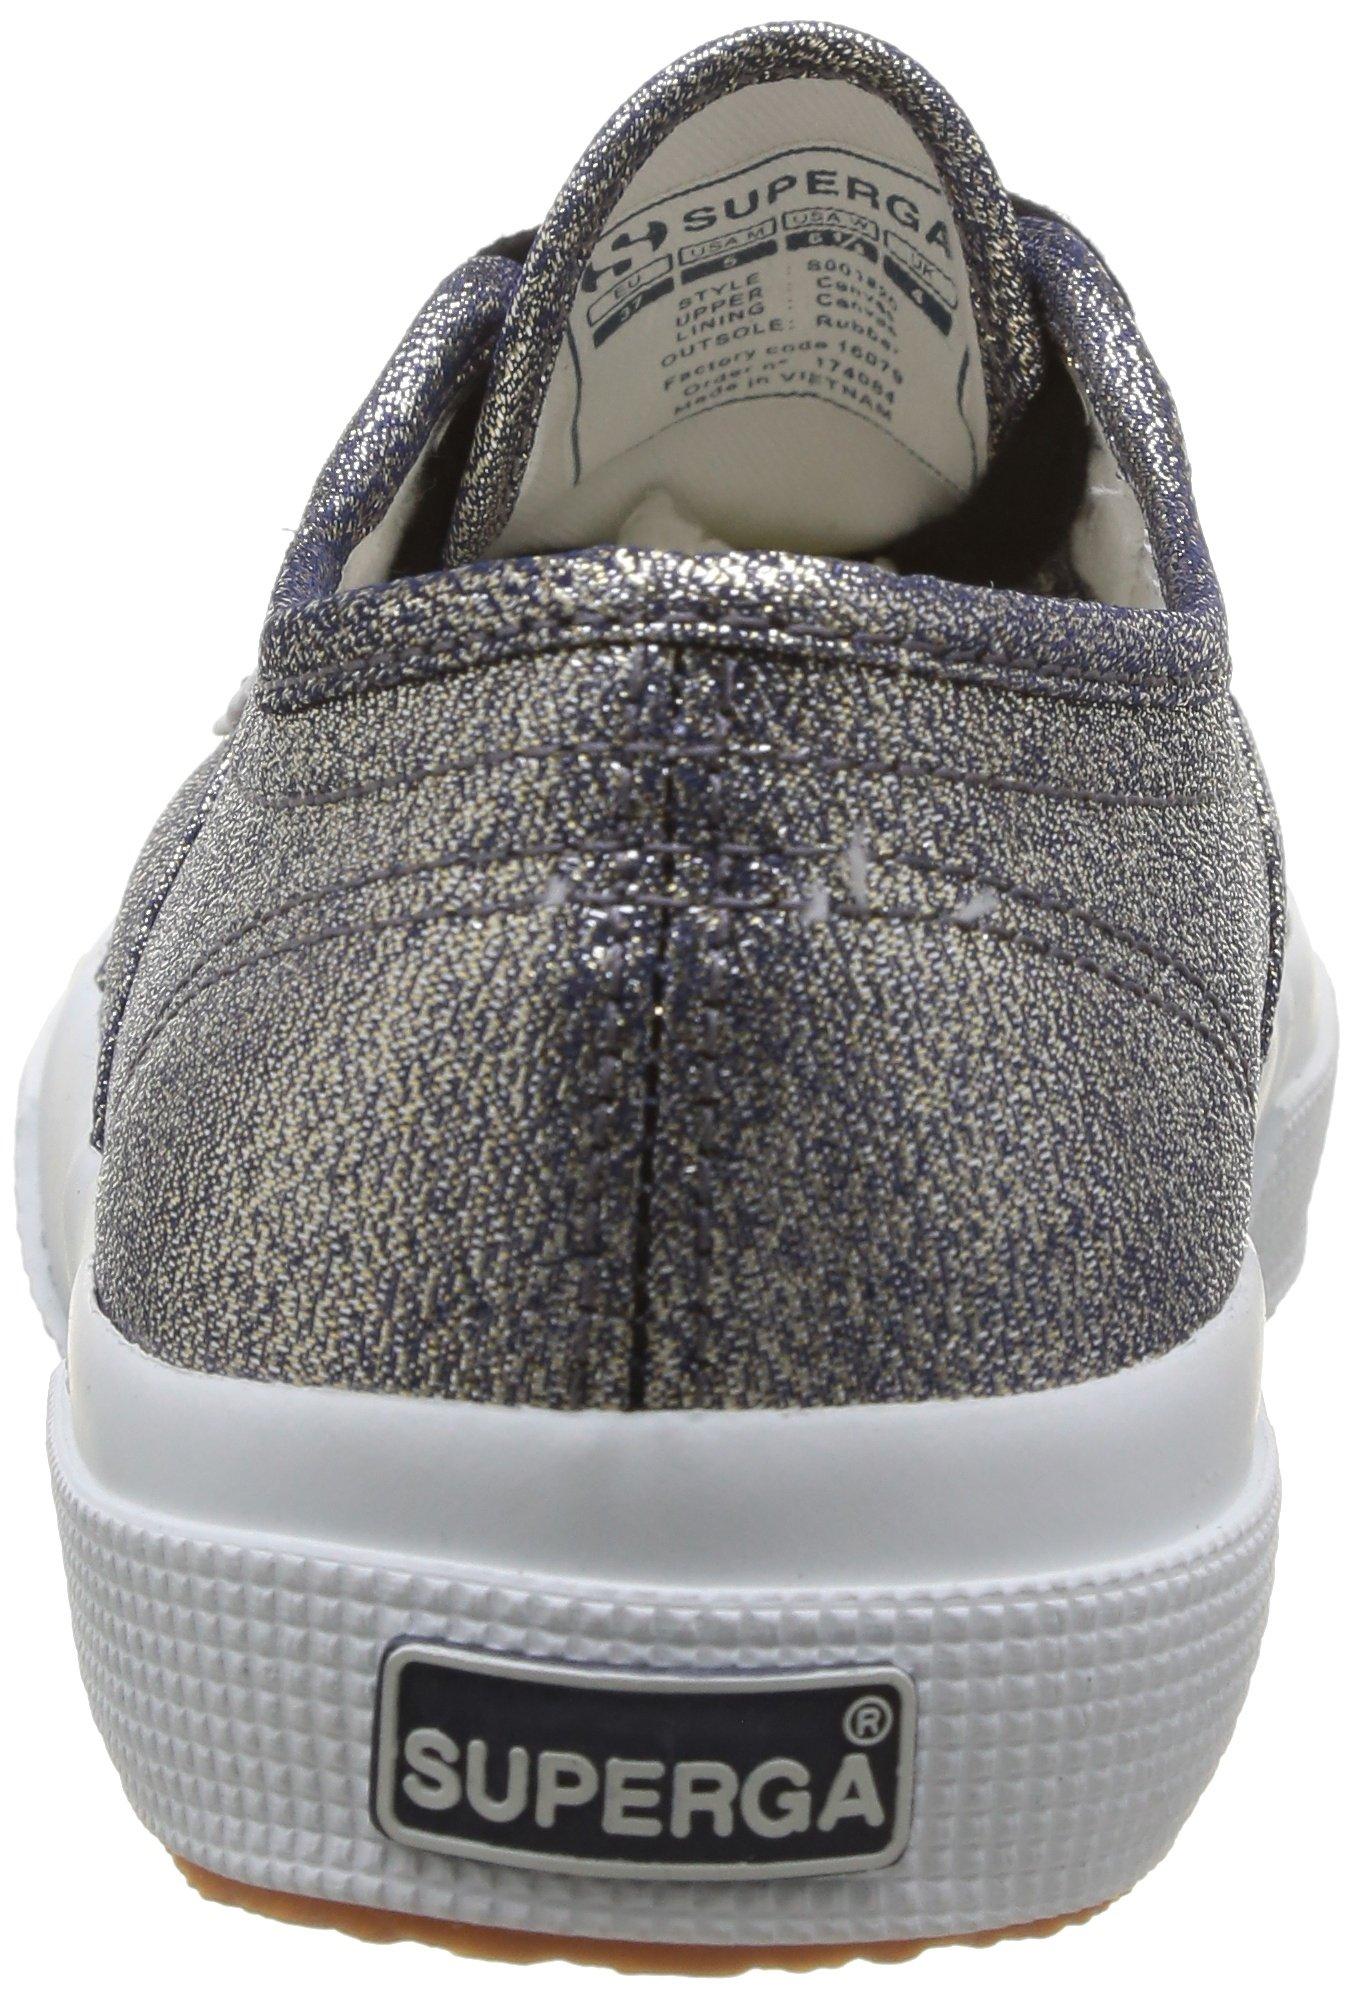 SUPERGA 2750-lamew, Sneaker Donna 2 spesavip